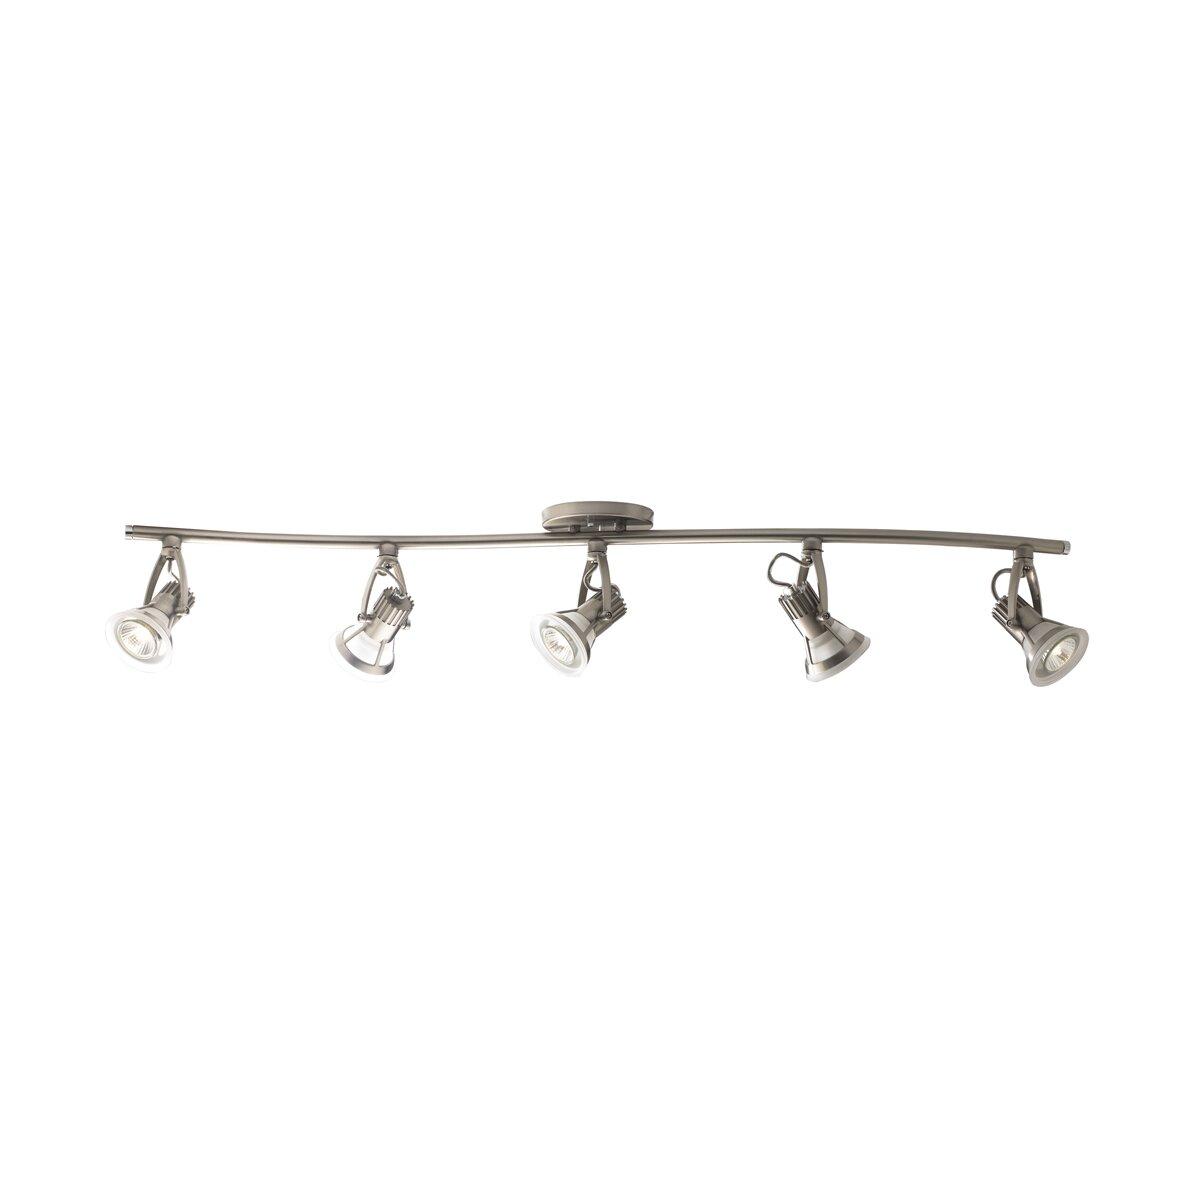 eurofase vortex 5 light full track lighting kit reviews wayfair. Black Bedroom Furniture Sets. Home Design Ideas